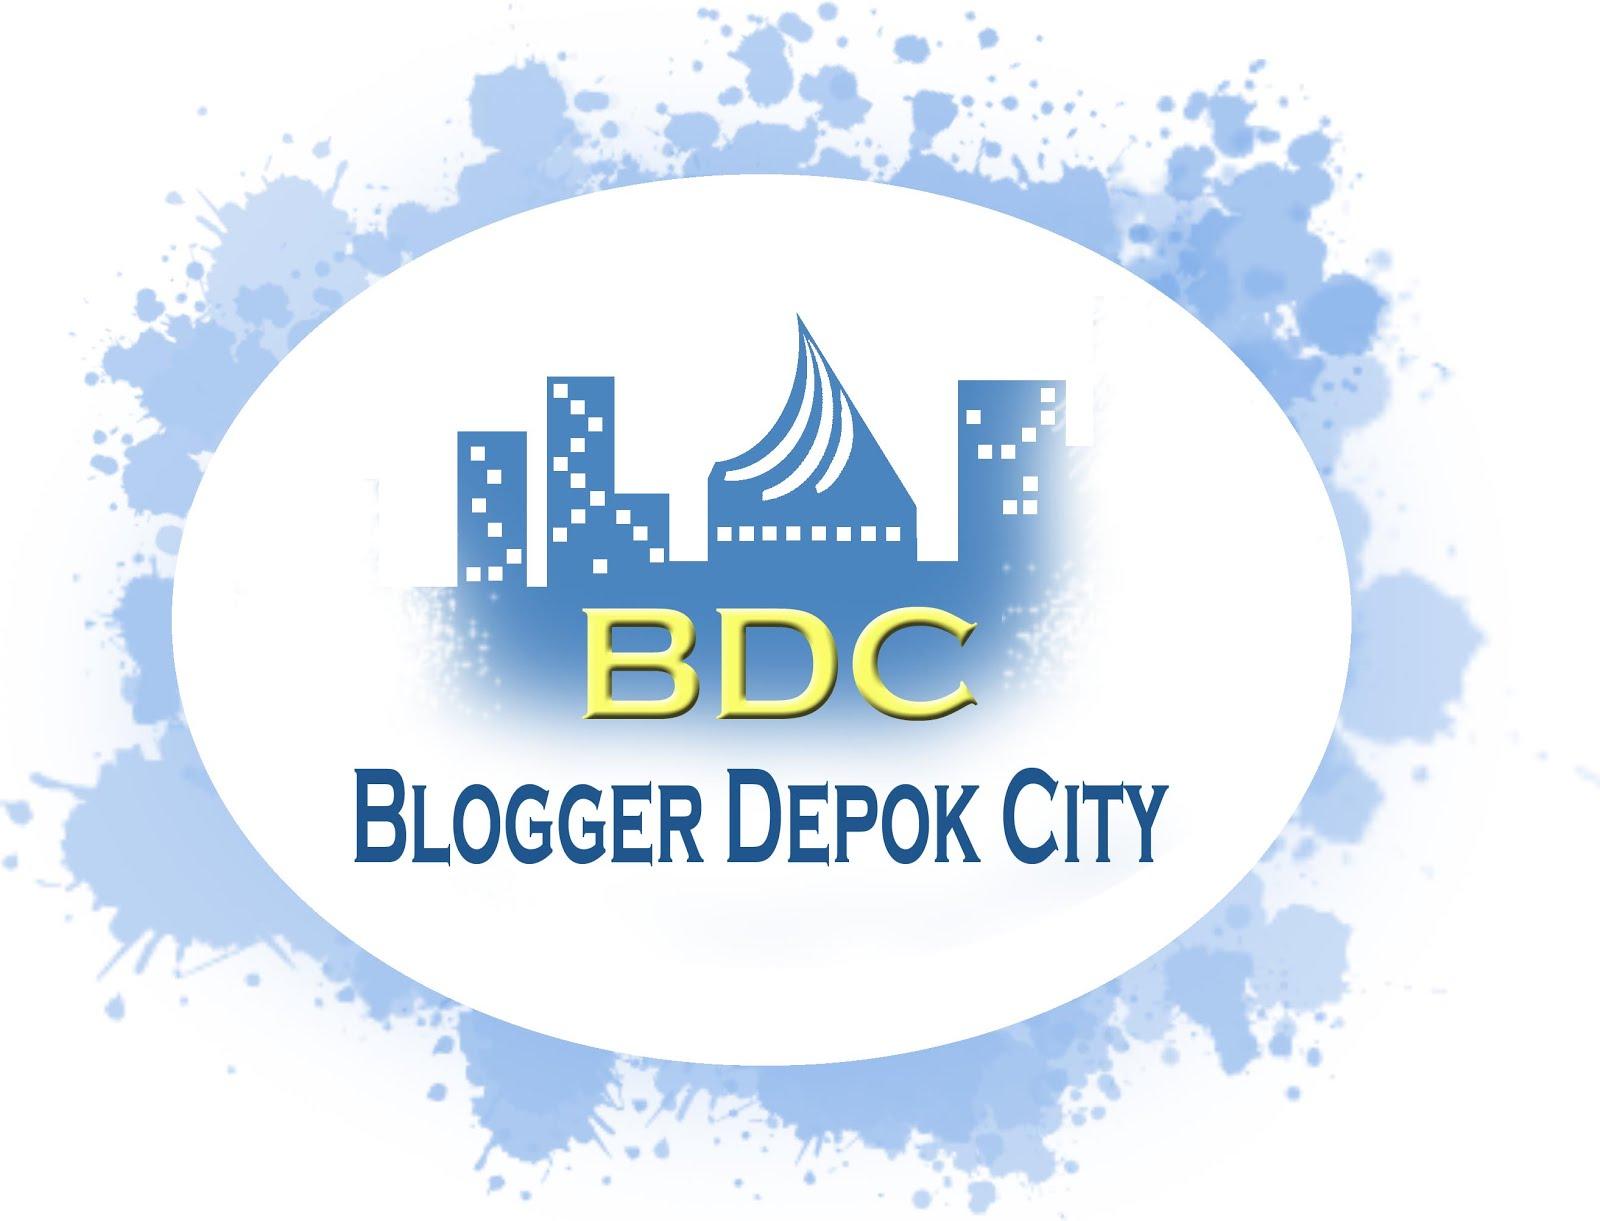 BLOGGER DEPOK CITY